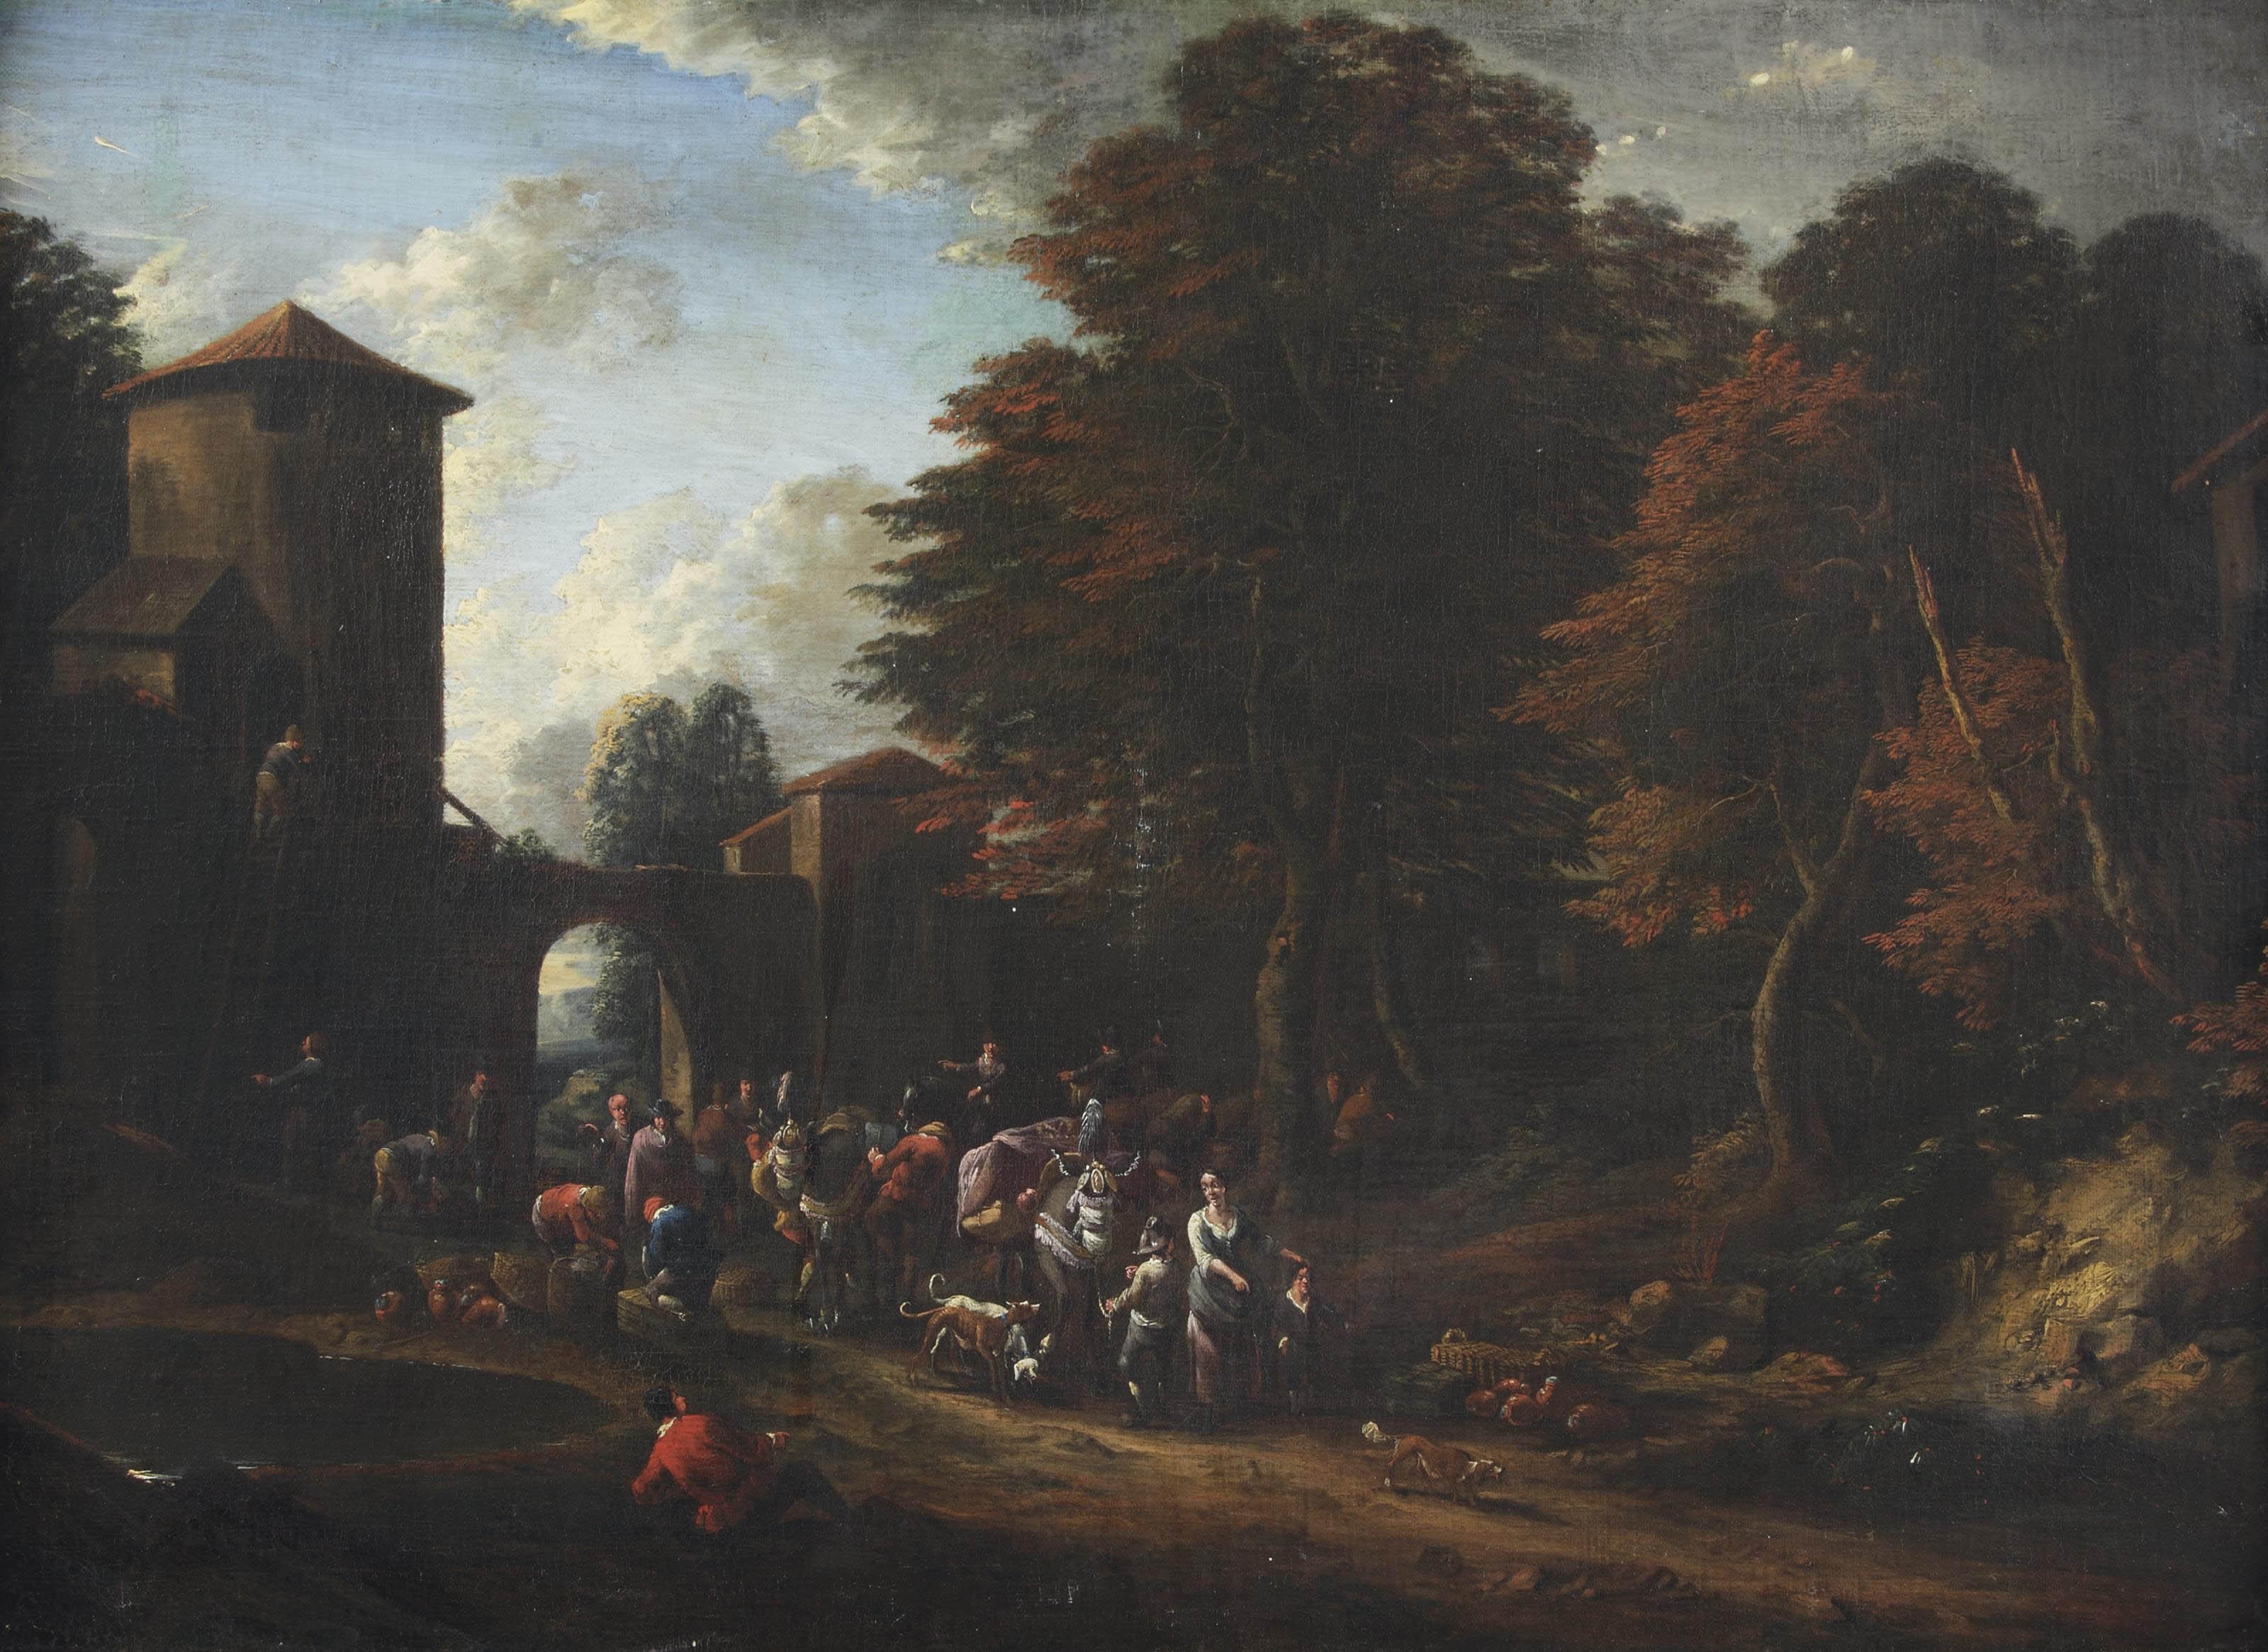 A wooded landscape with merchants near a village gate